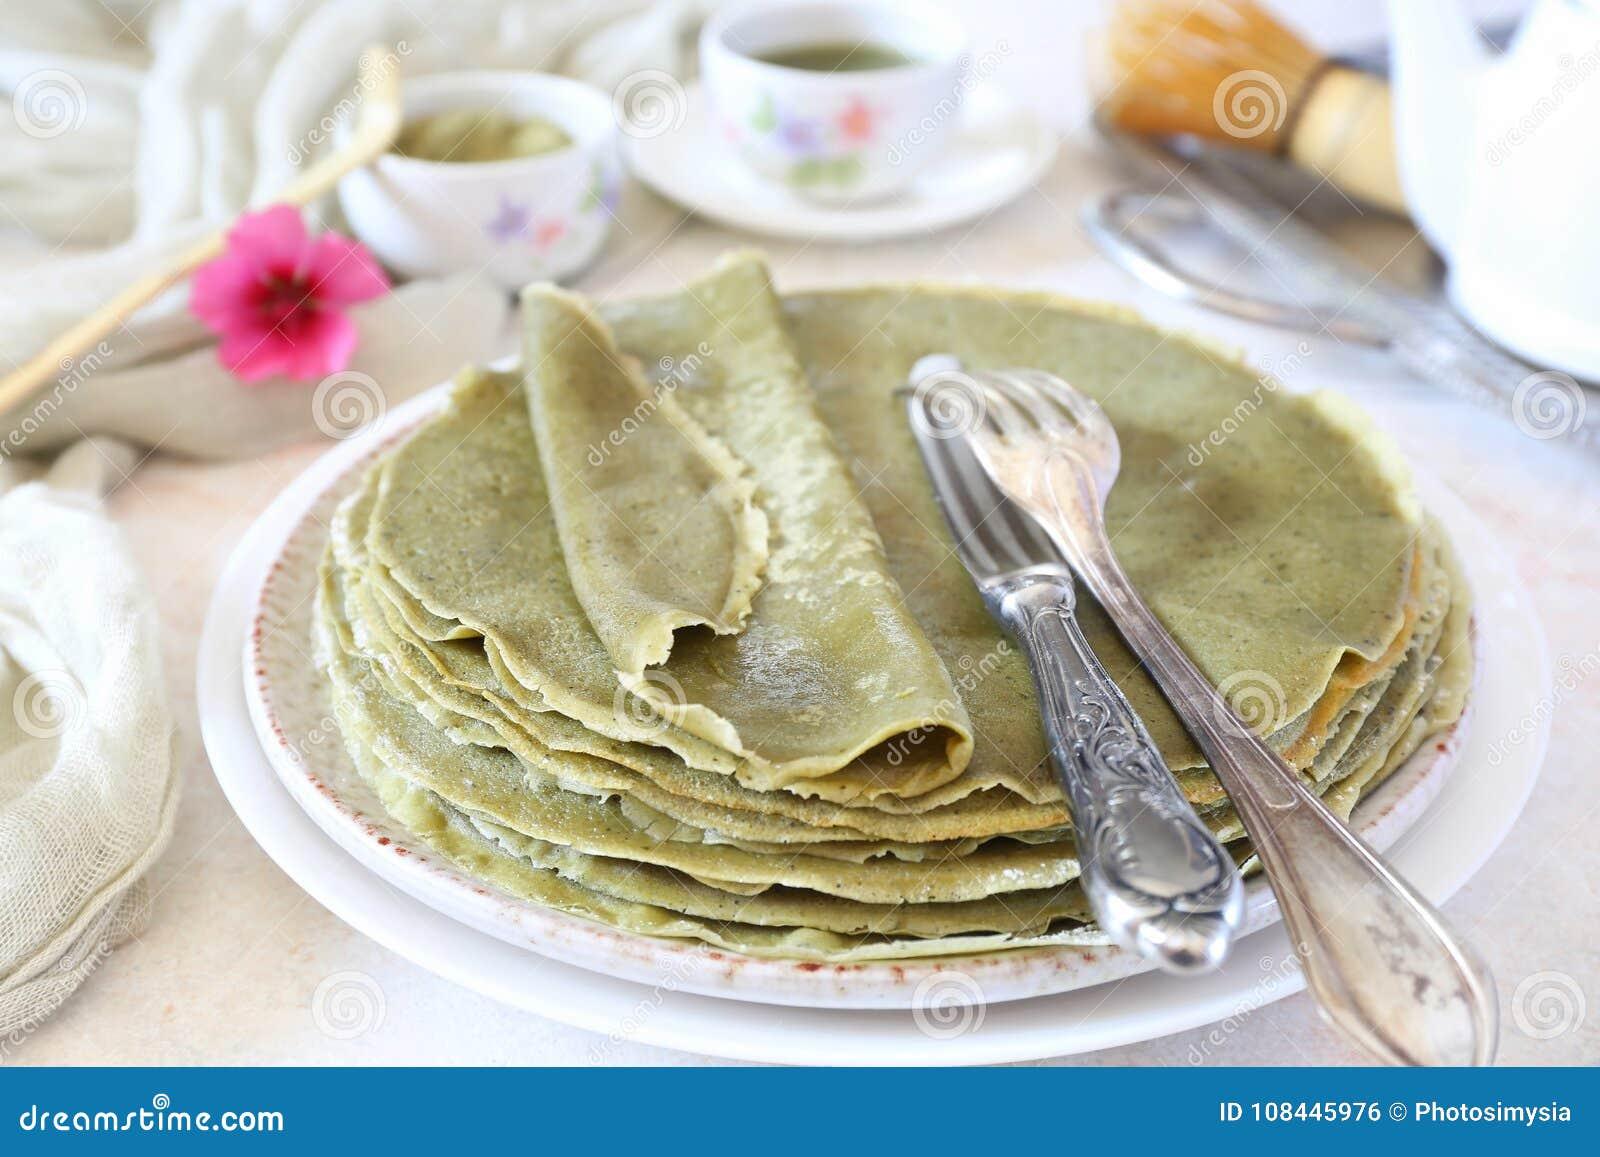 Matcha绿茶薄煎饼俄式薄煎饼